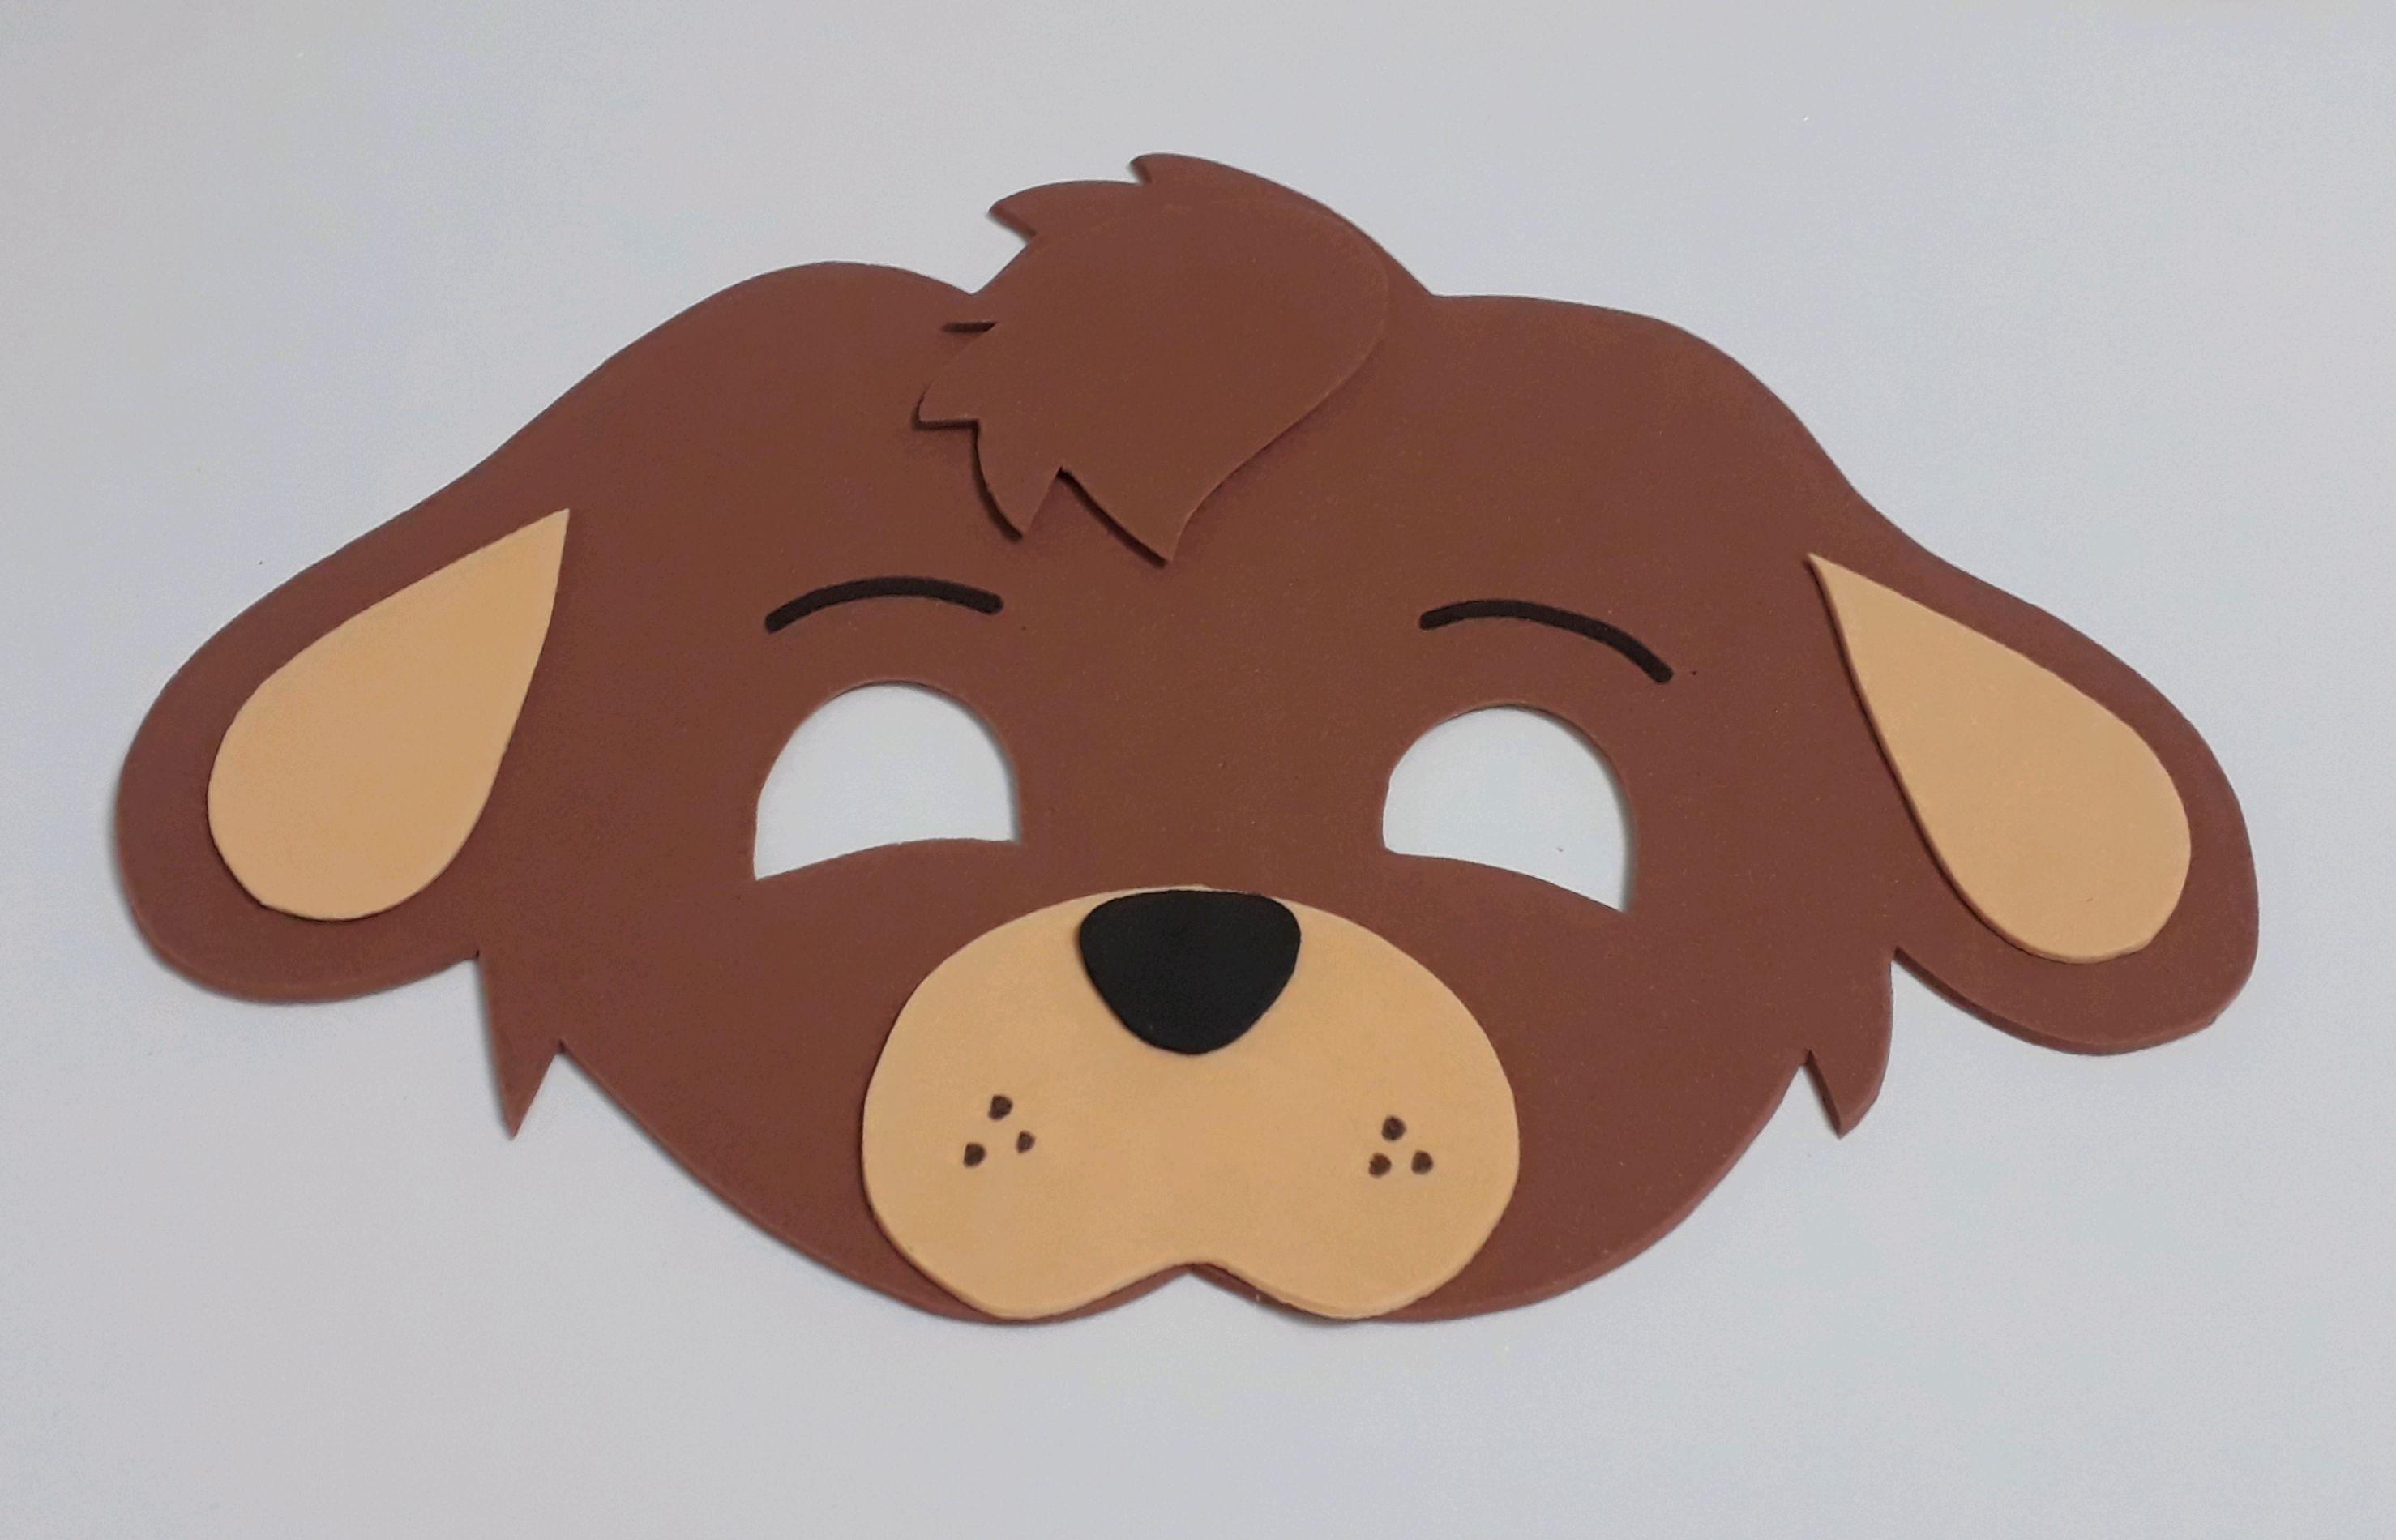 Mascara Cachorro No Elo7 Joao Maria Eecc21